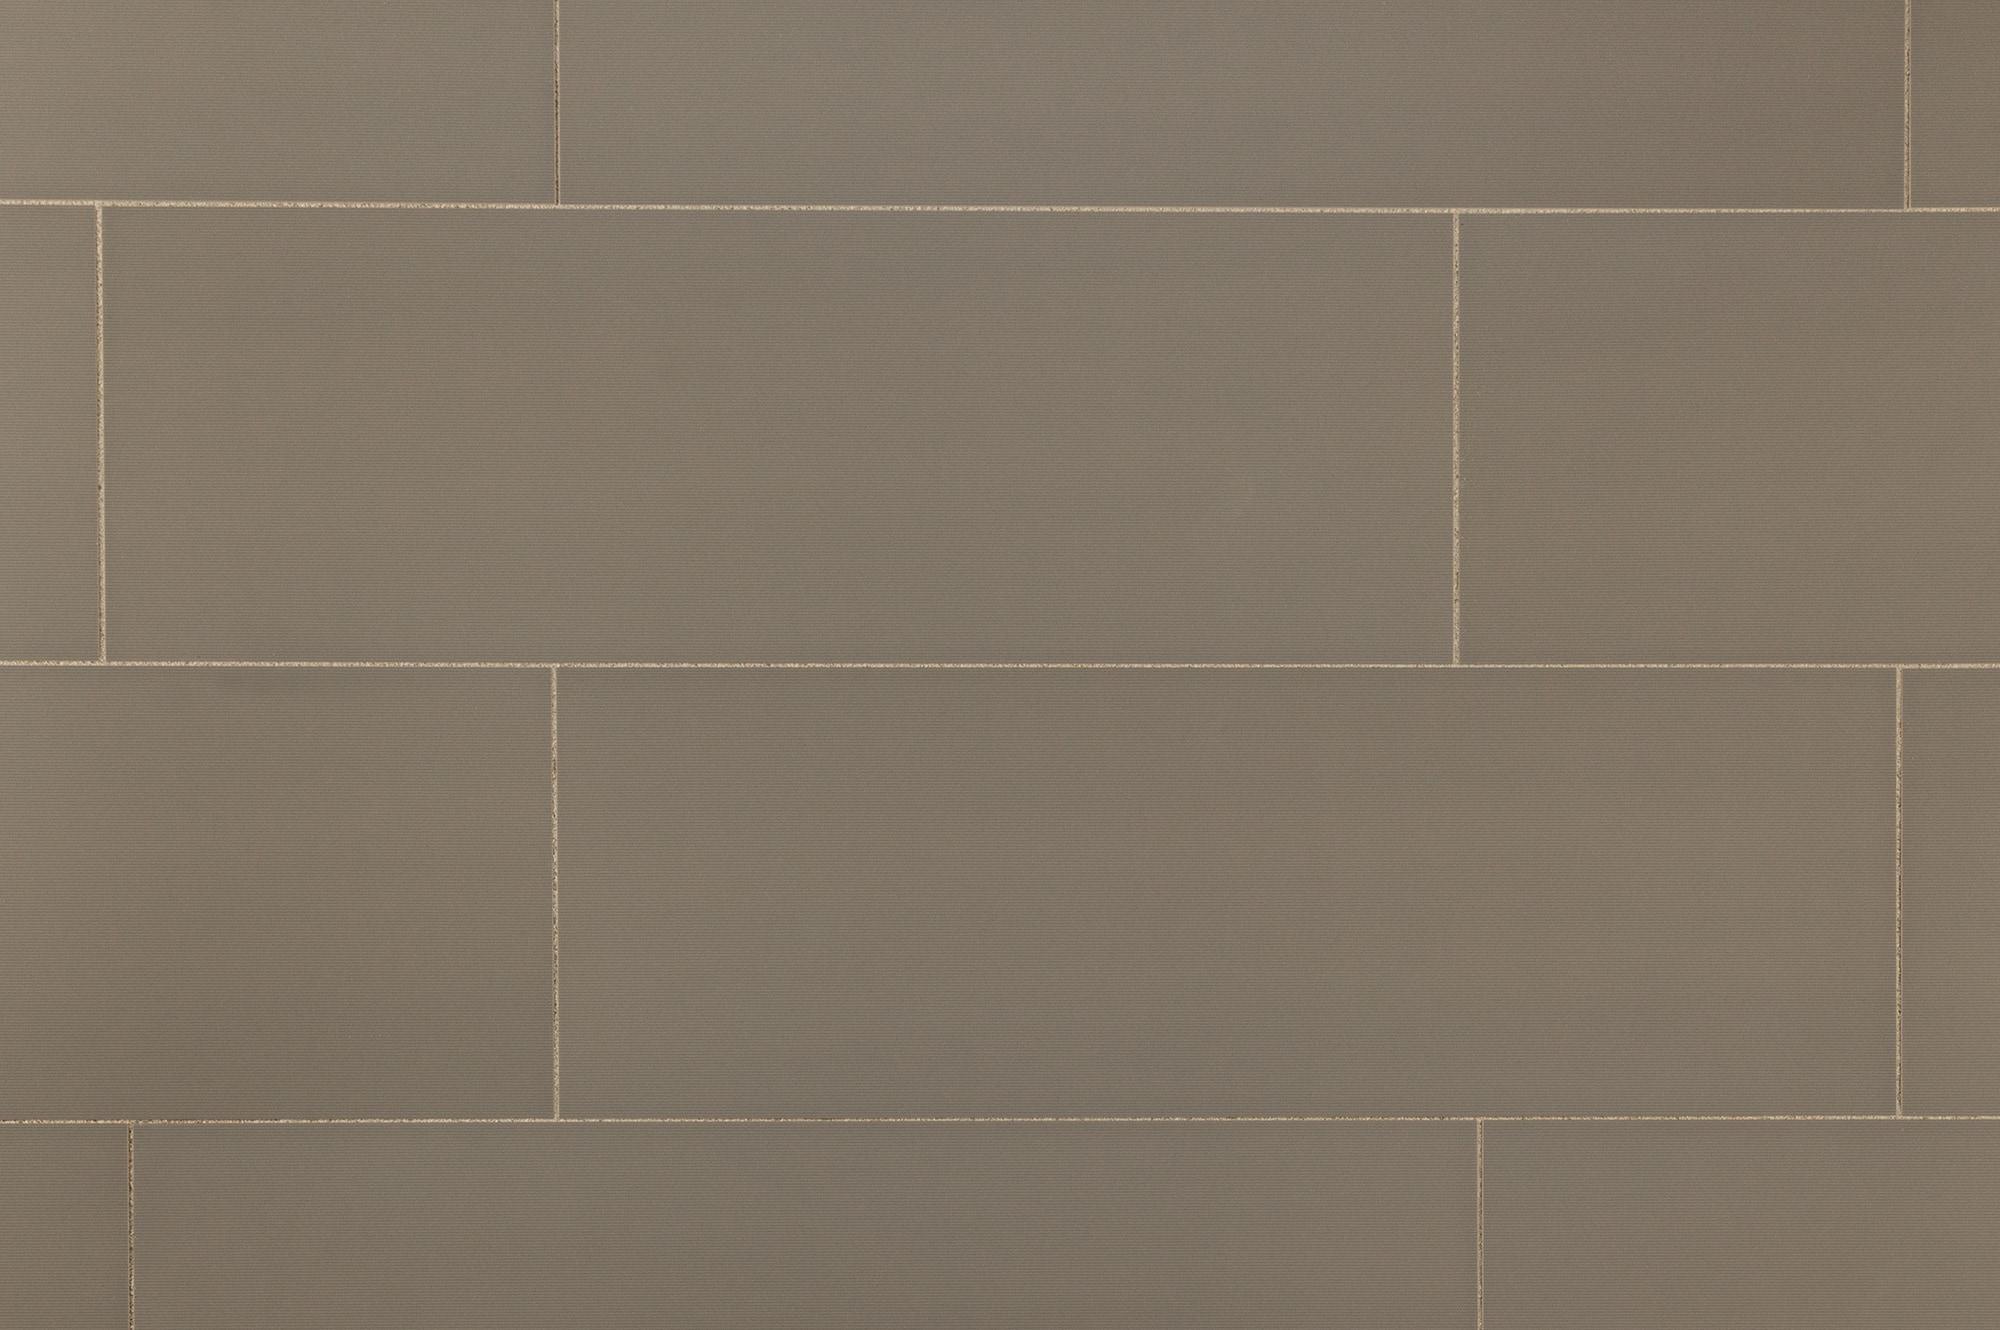 Alzatina Ceramic Wall Tile Linea Collection Gray Acero Linear 12 X36 Q